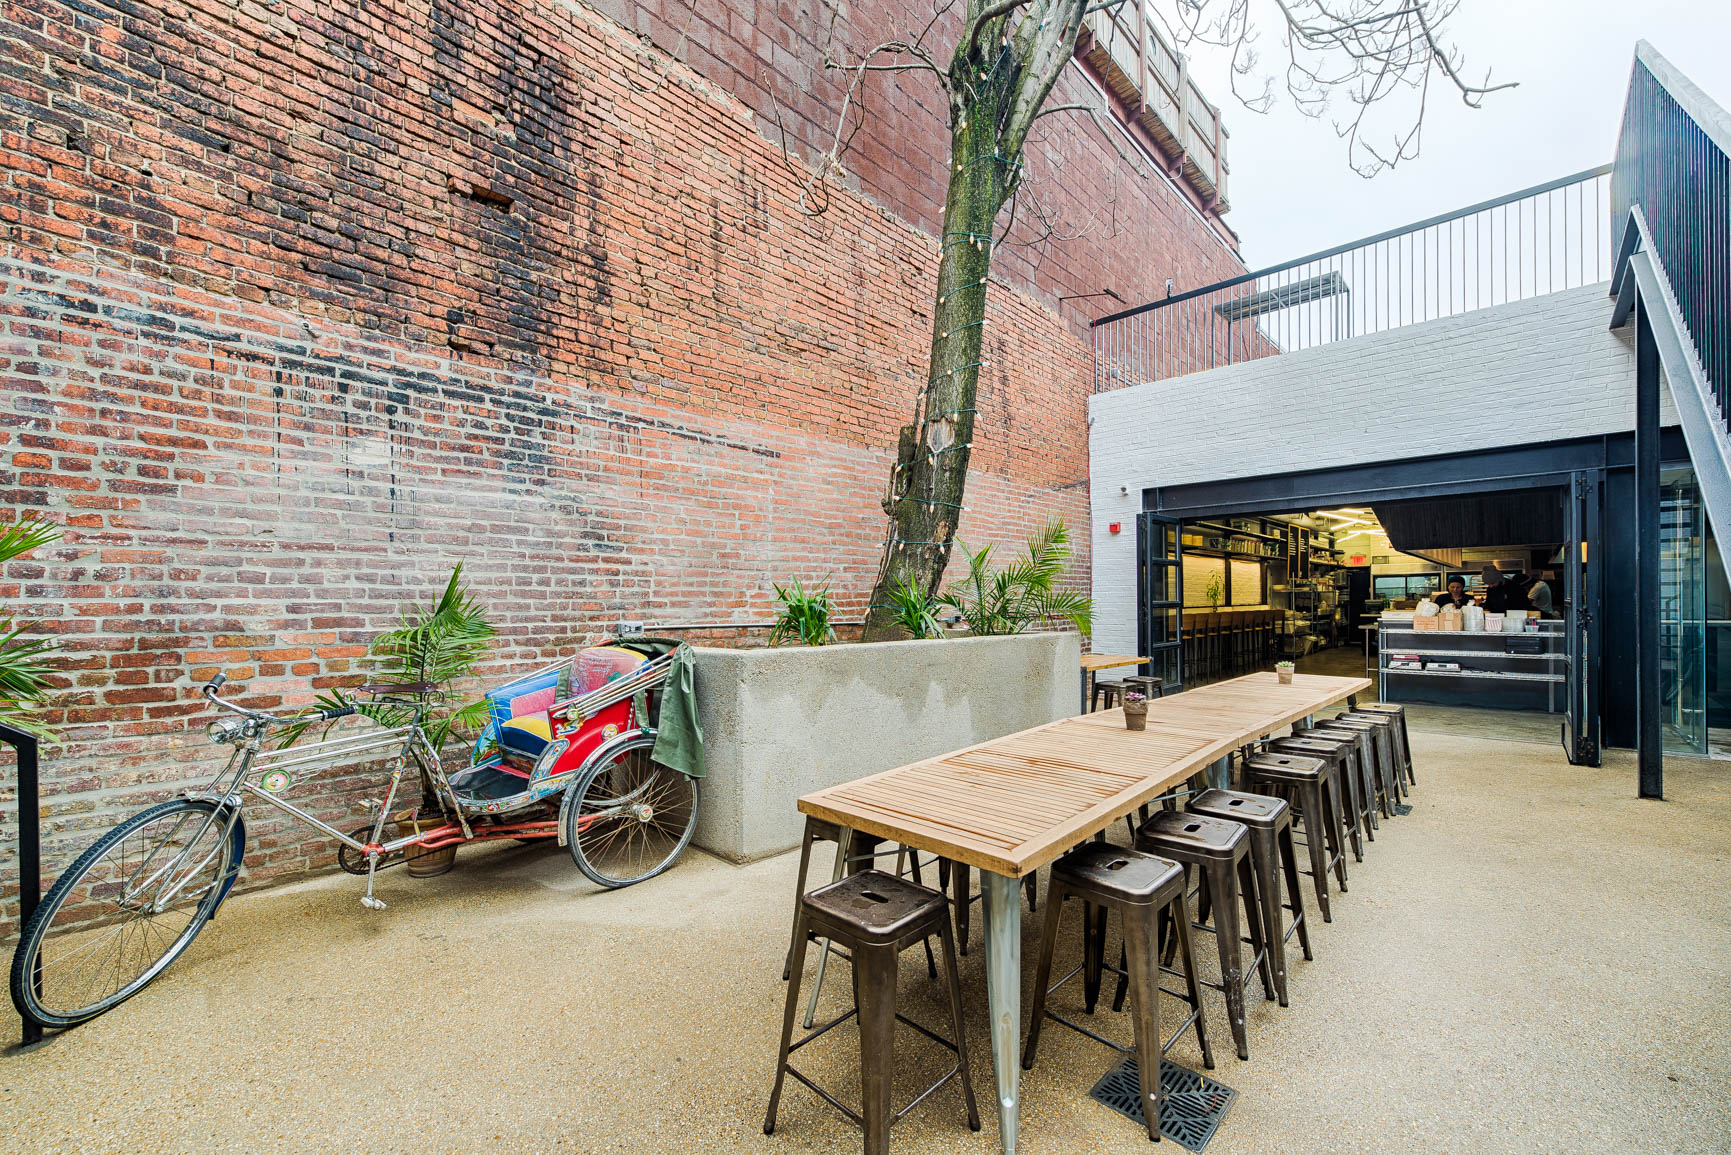 studio-saint-bars-and-restaurants-maketto-washington-dc-4